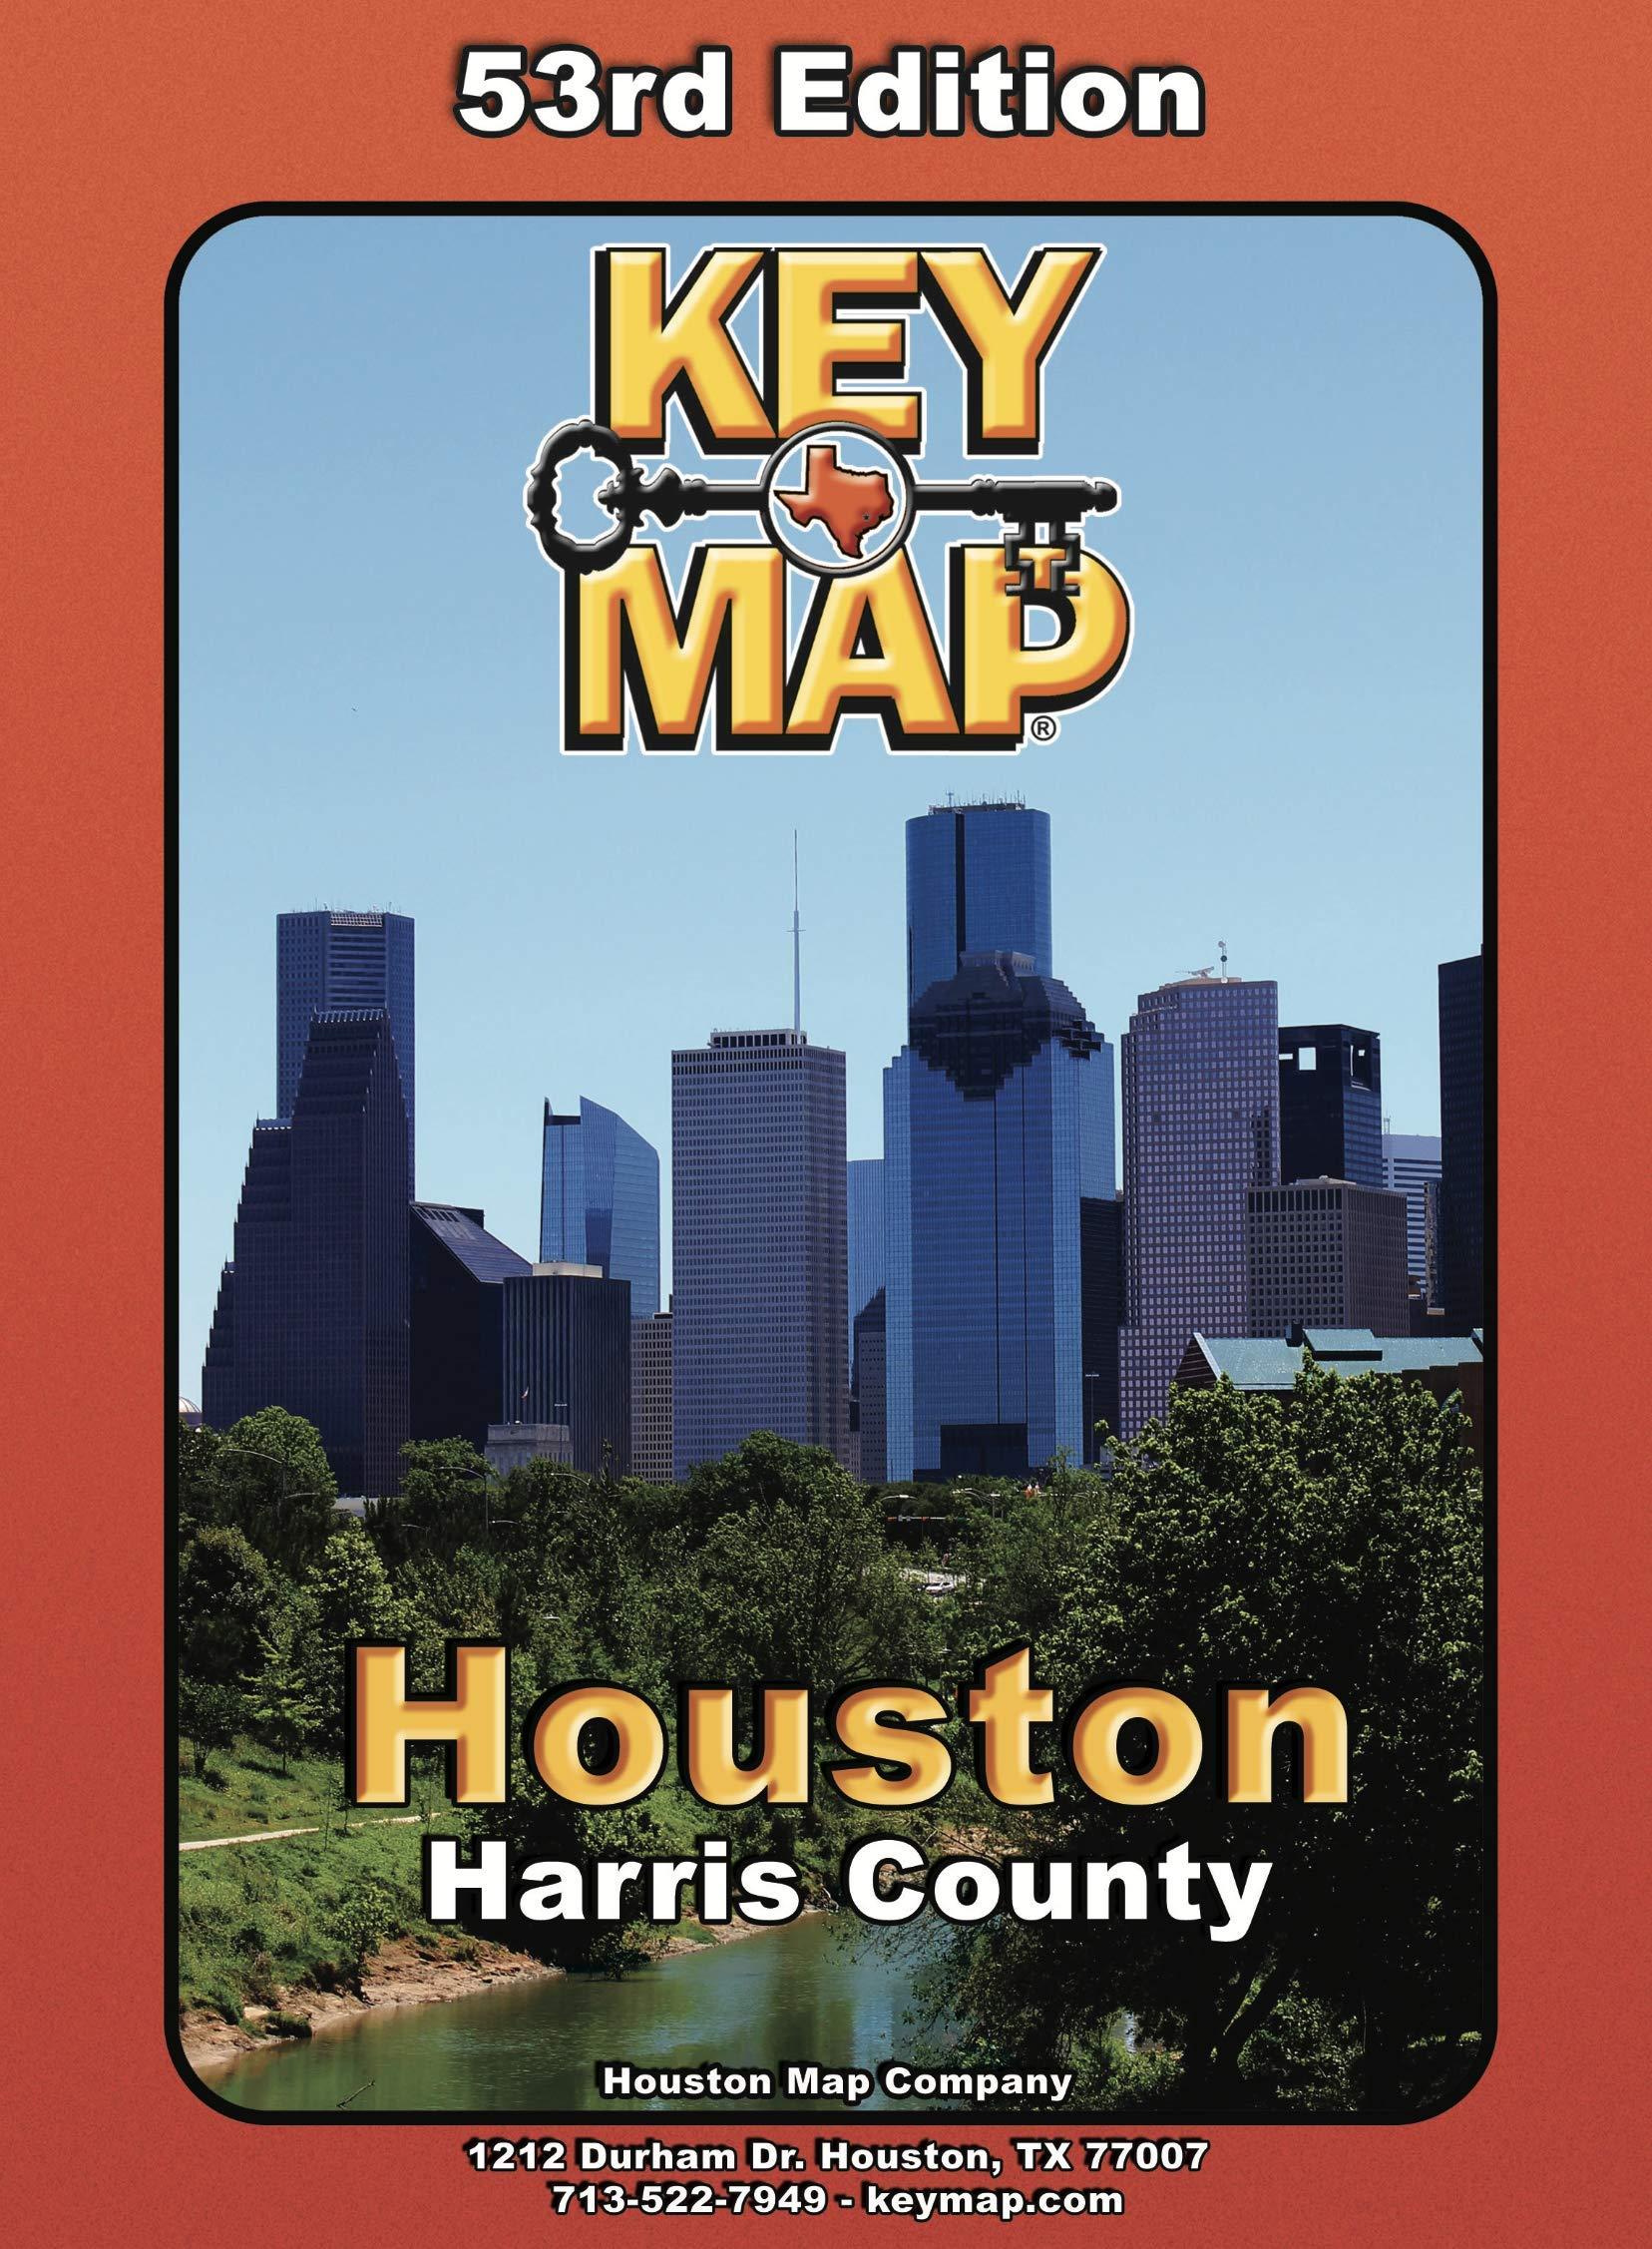 Key Maps Harris County - 53rd Edition